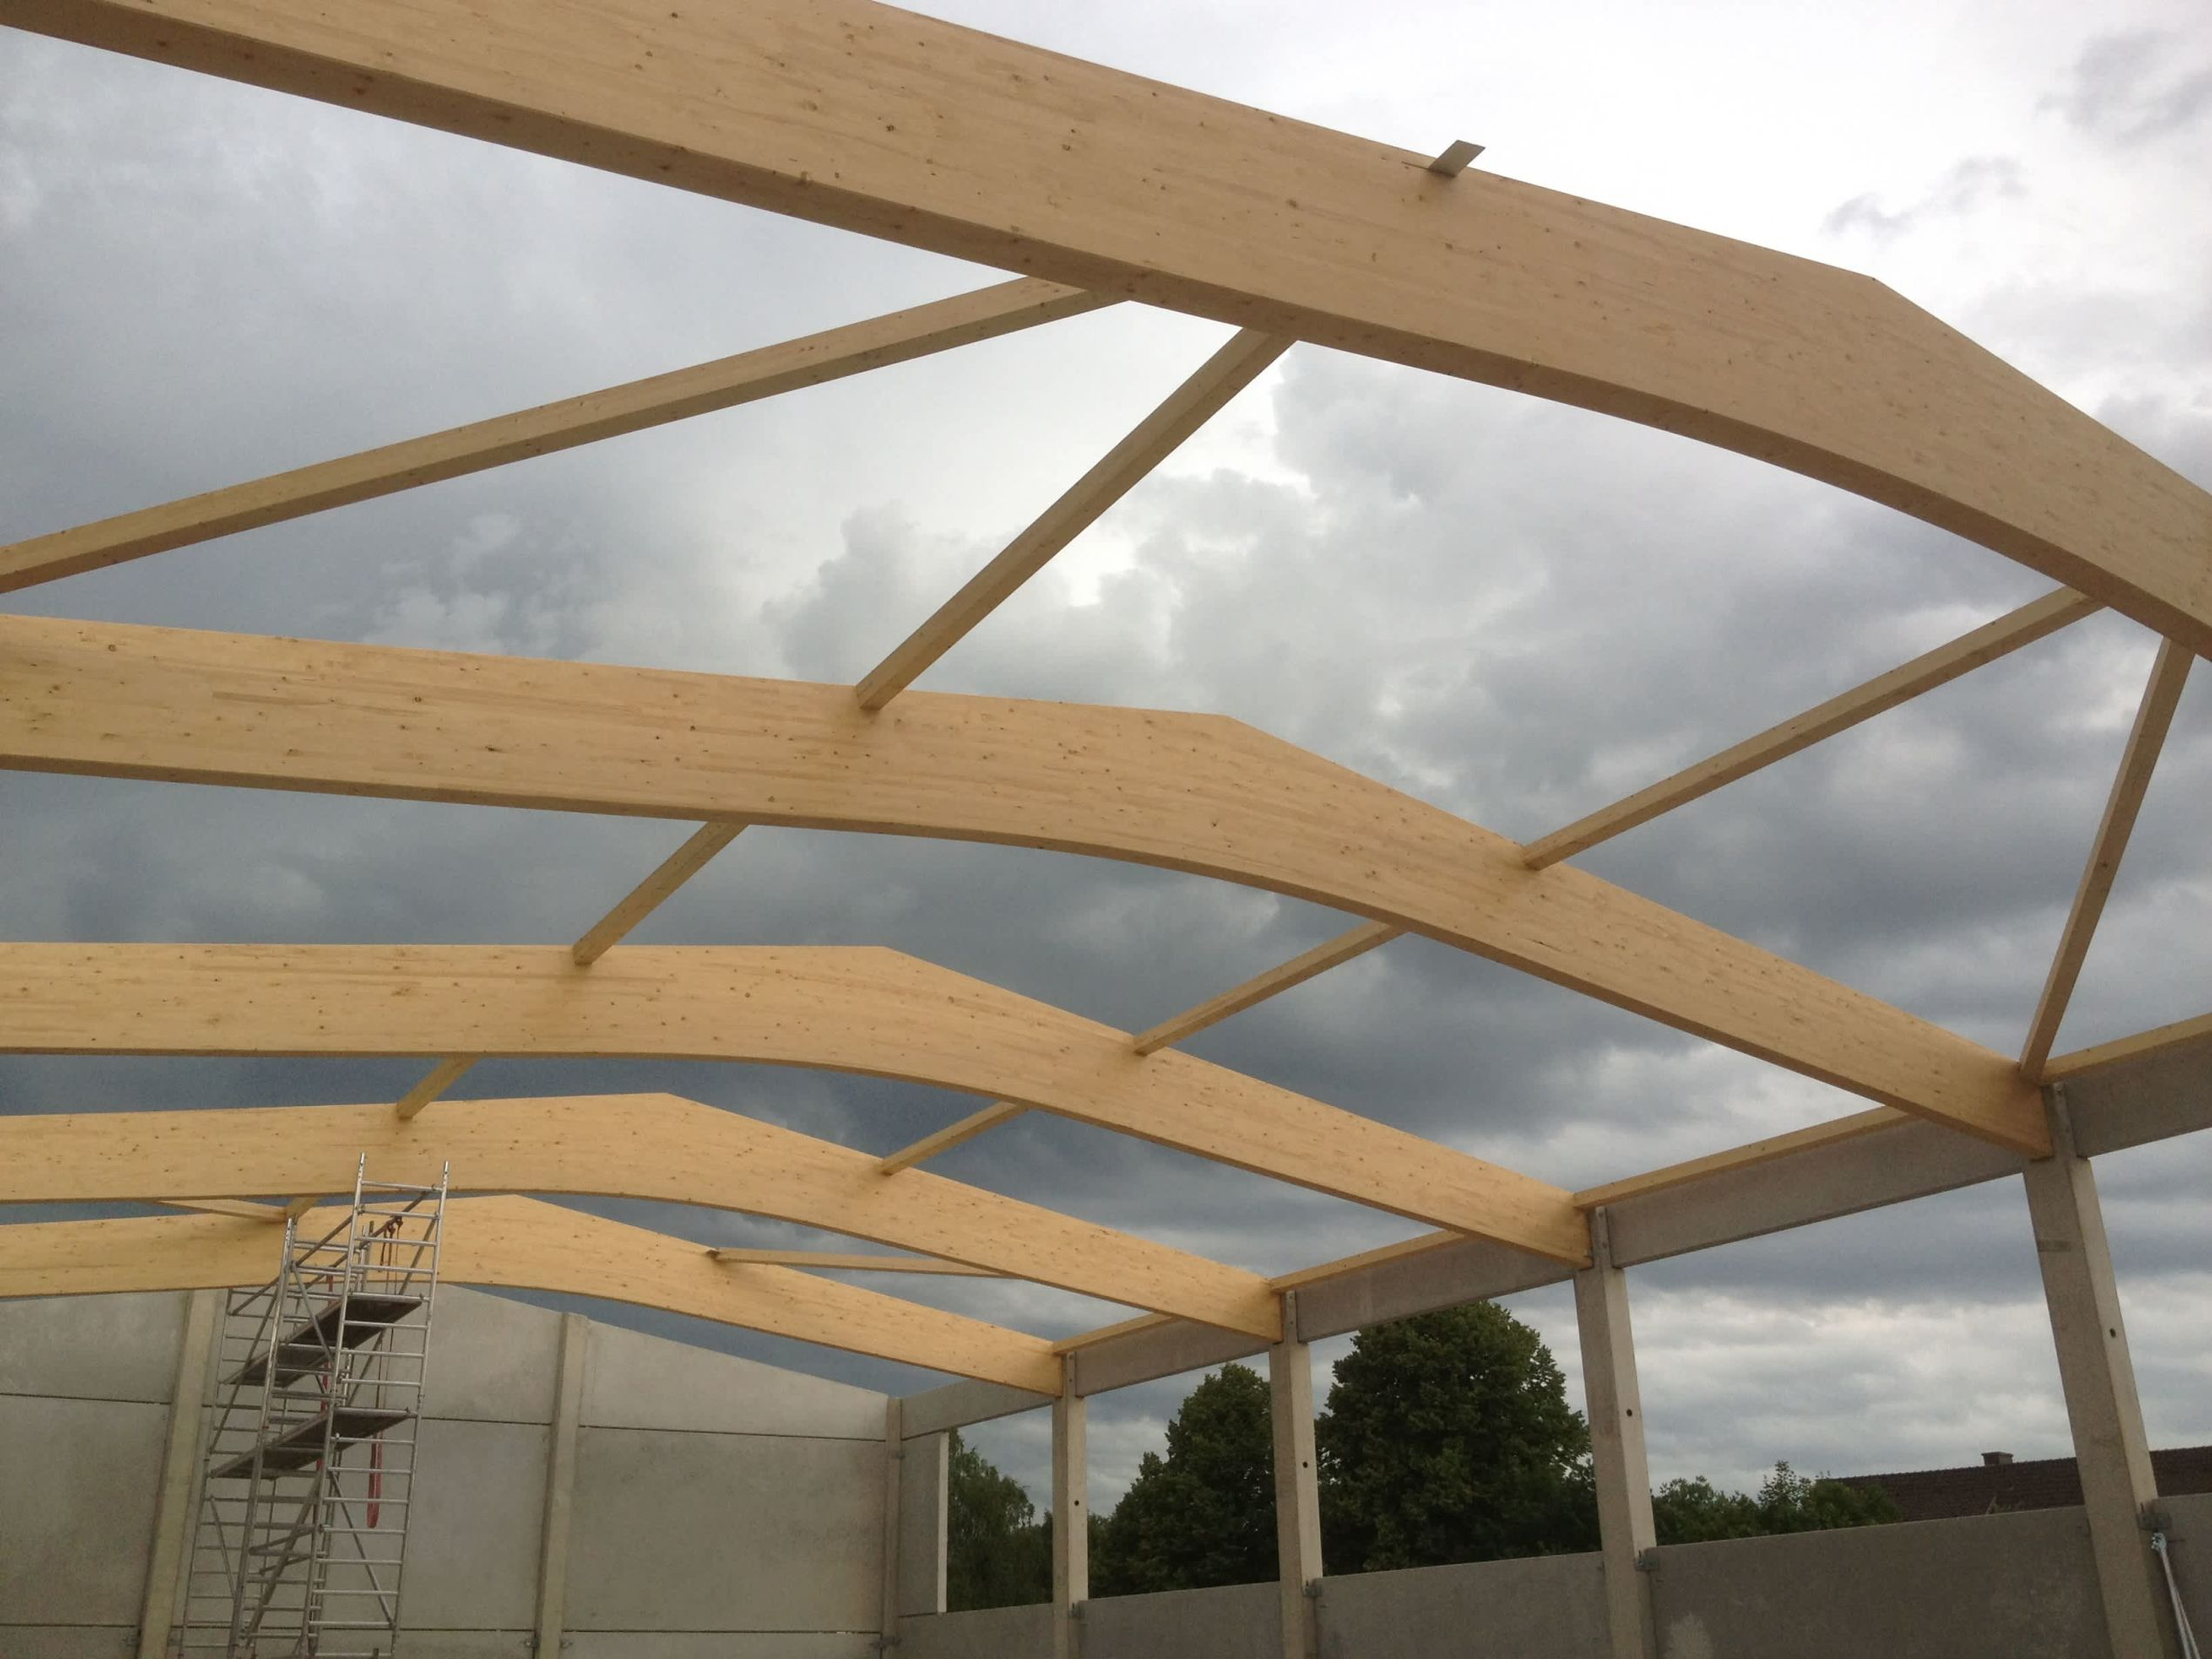 Ing.- Holzbau